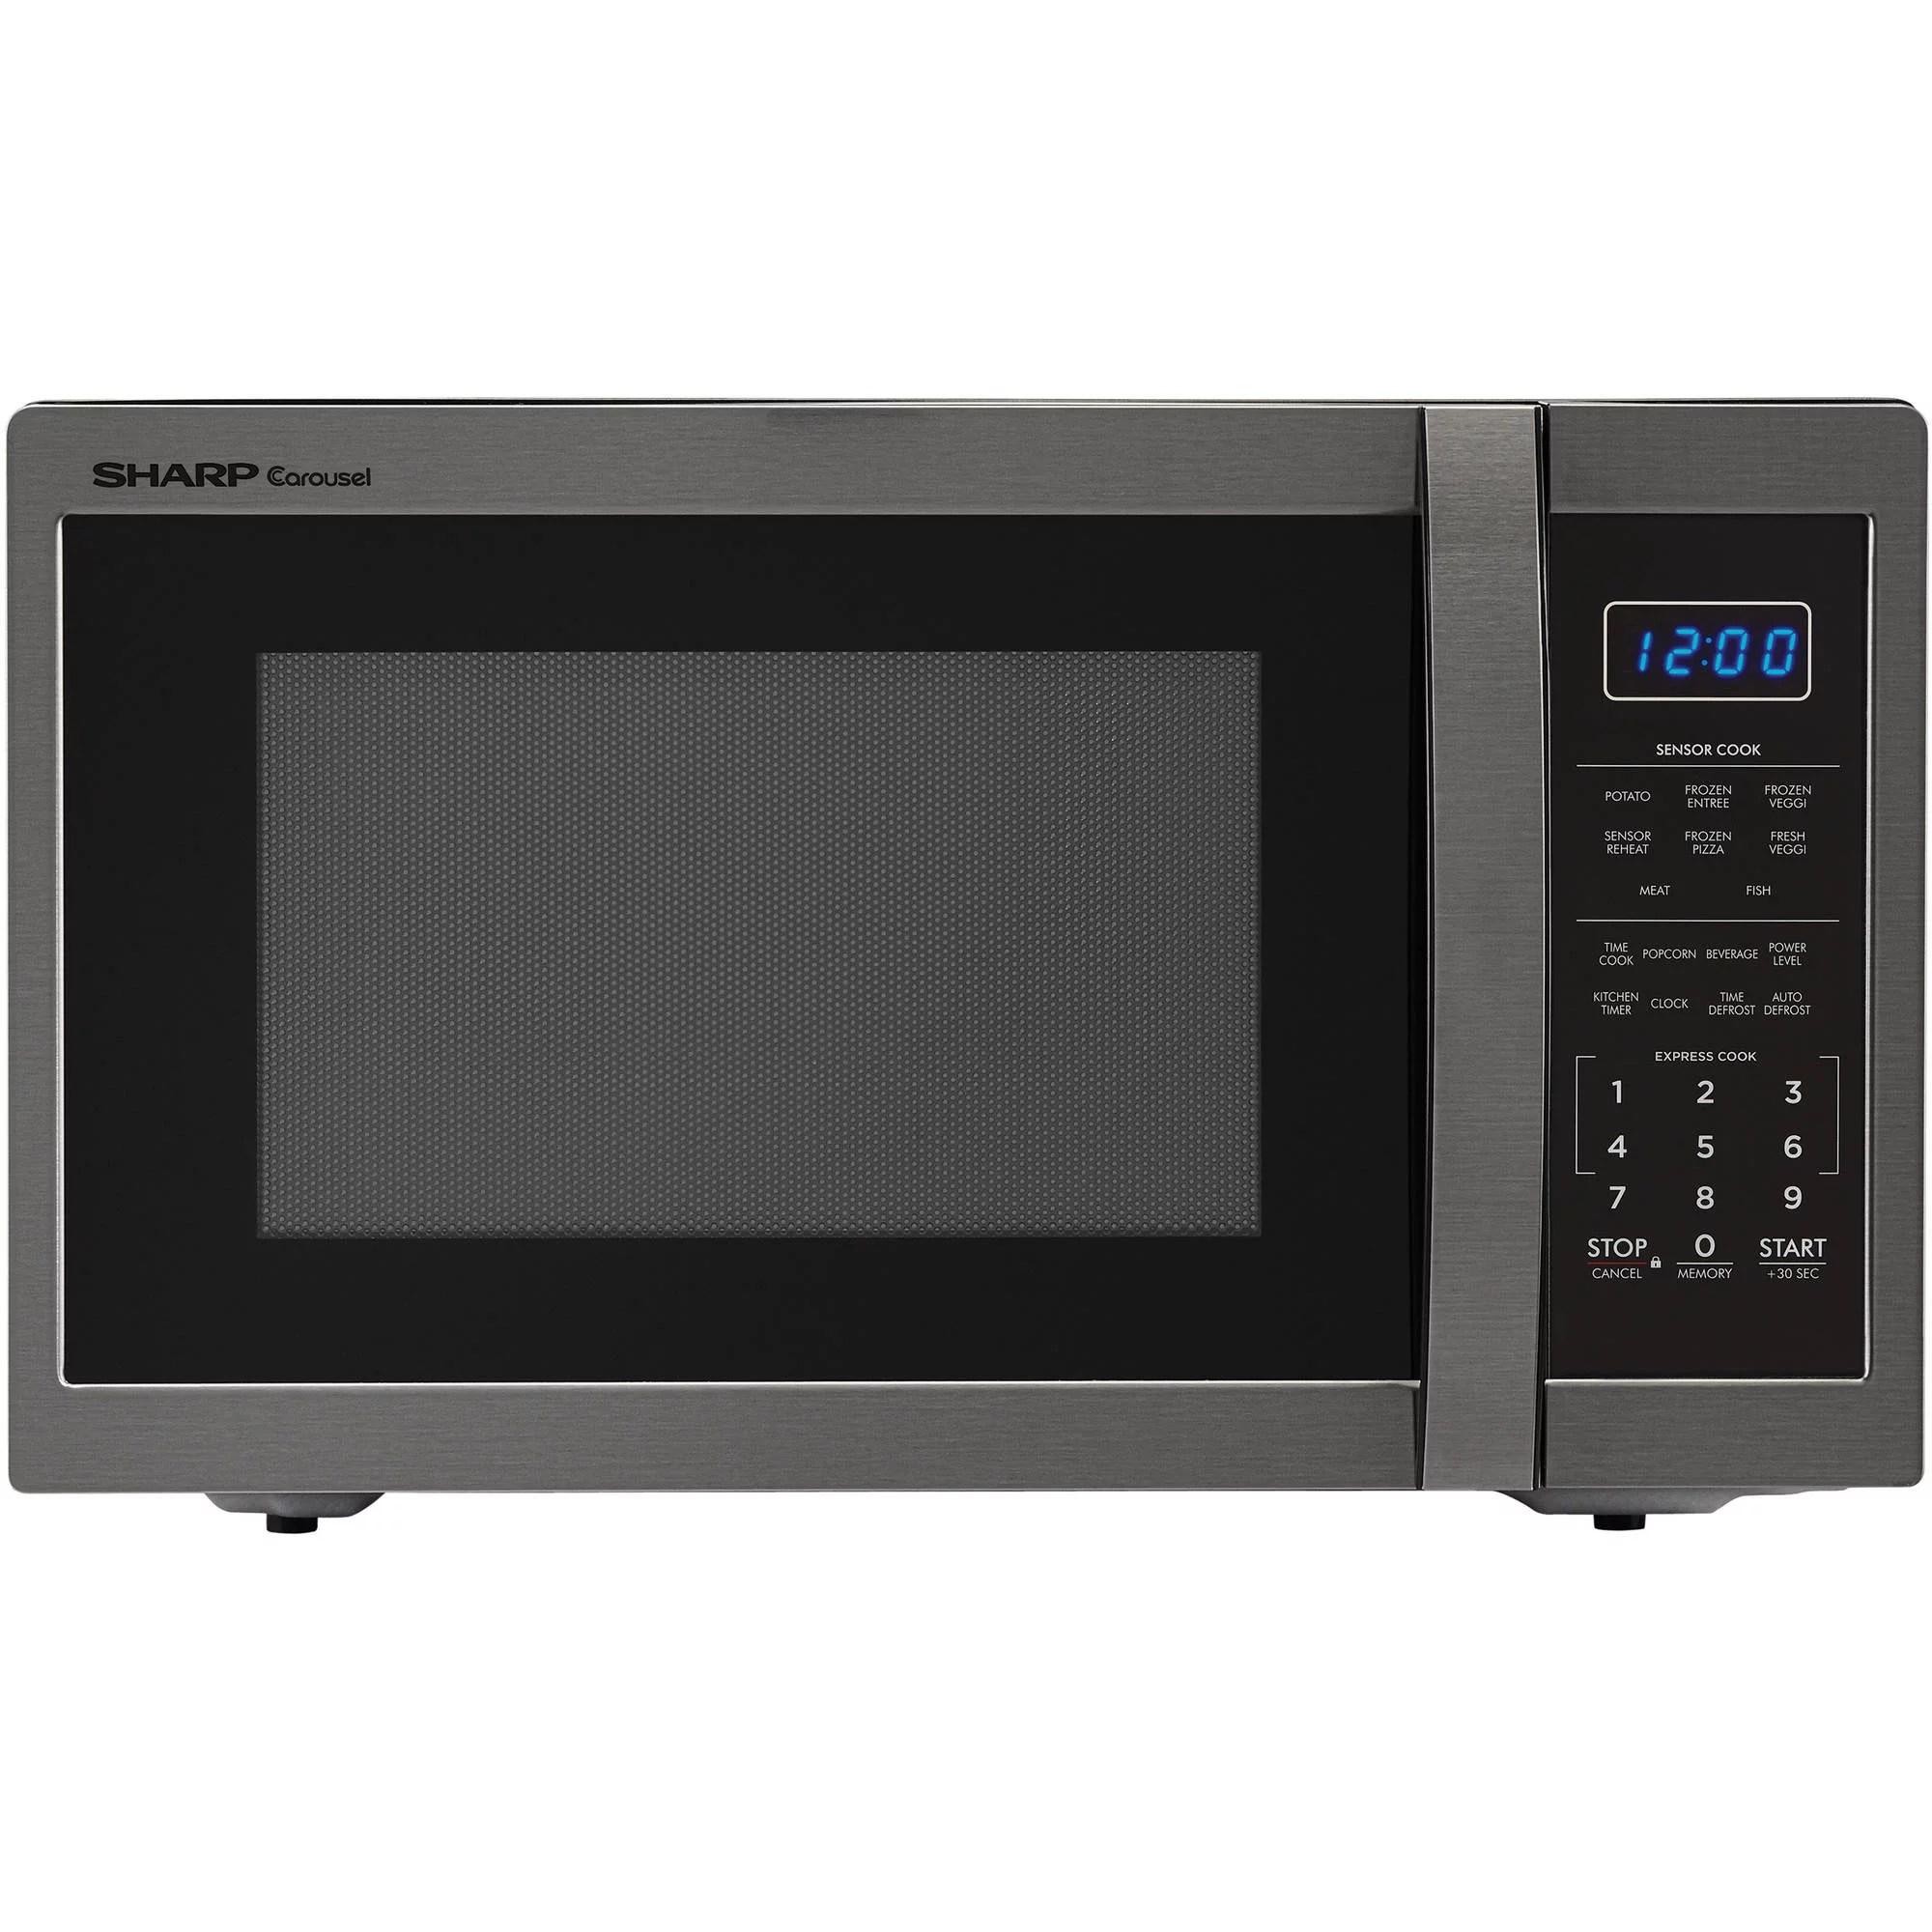 sharp zsmc1452ch 1 4 cu ft microwave black stainless steel walmart com